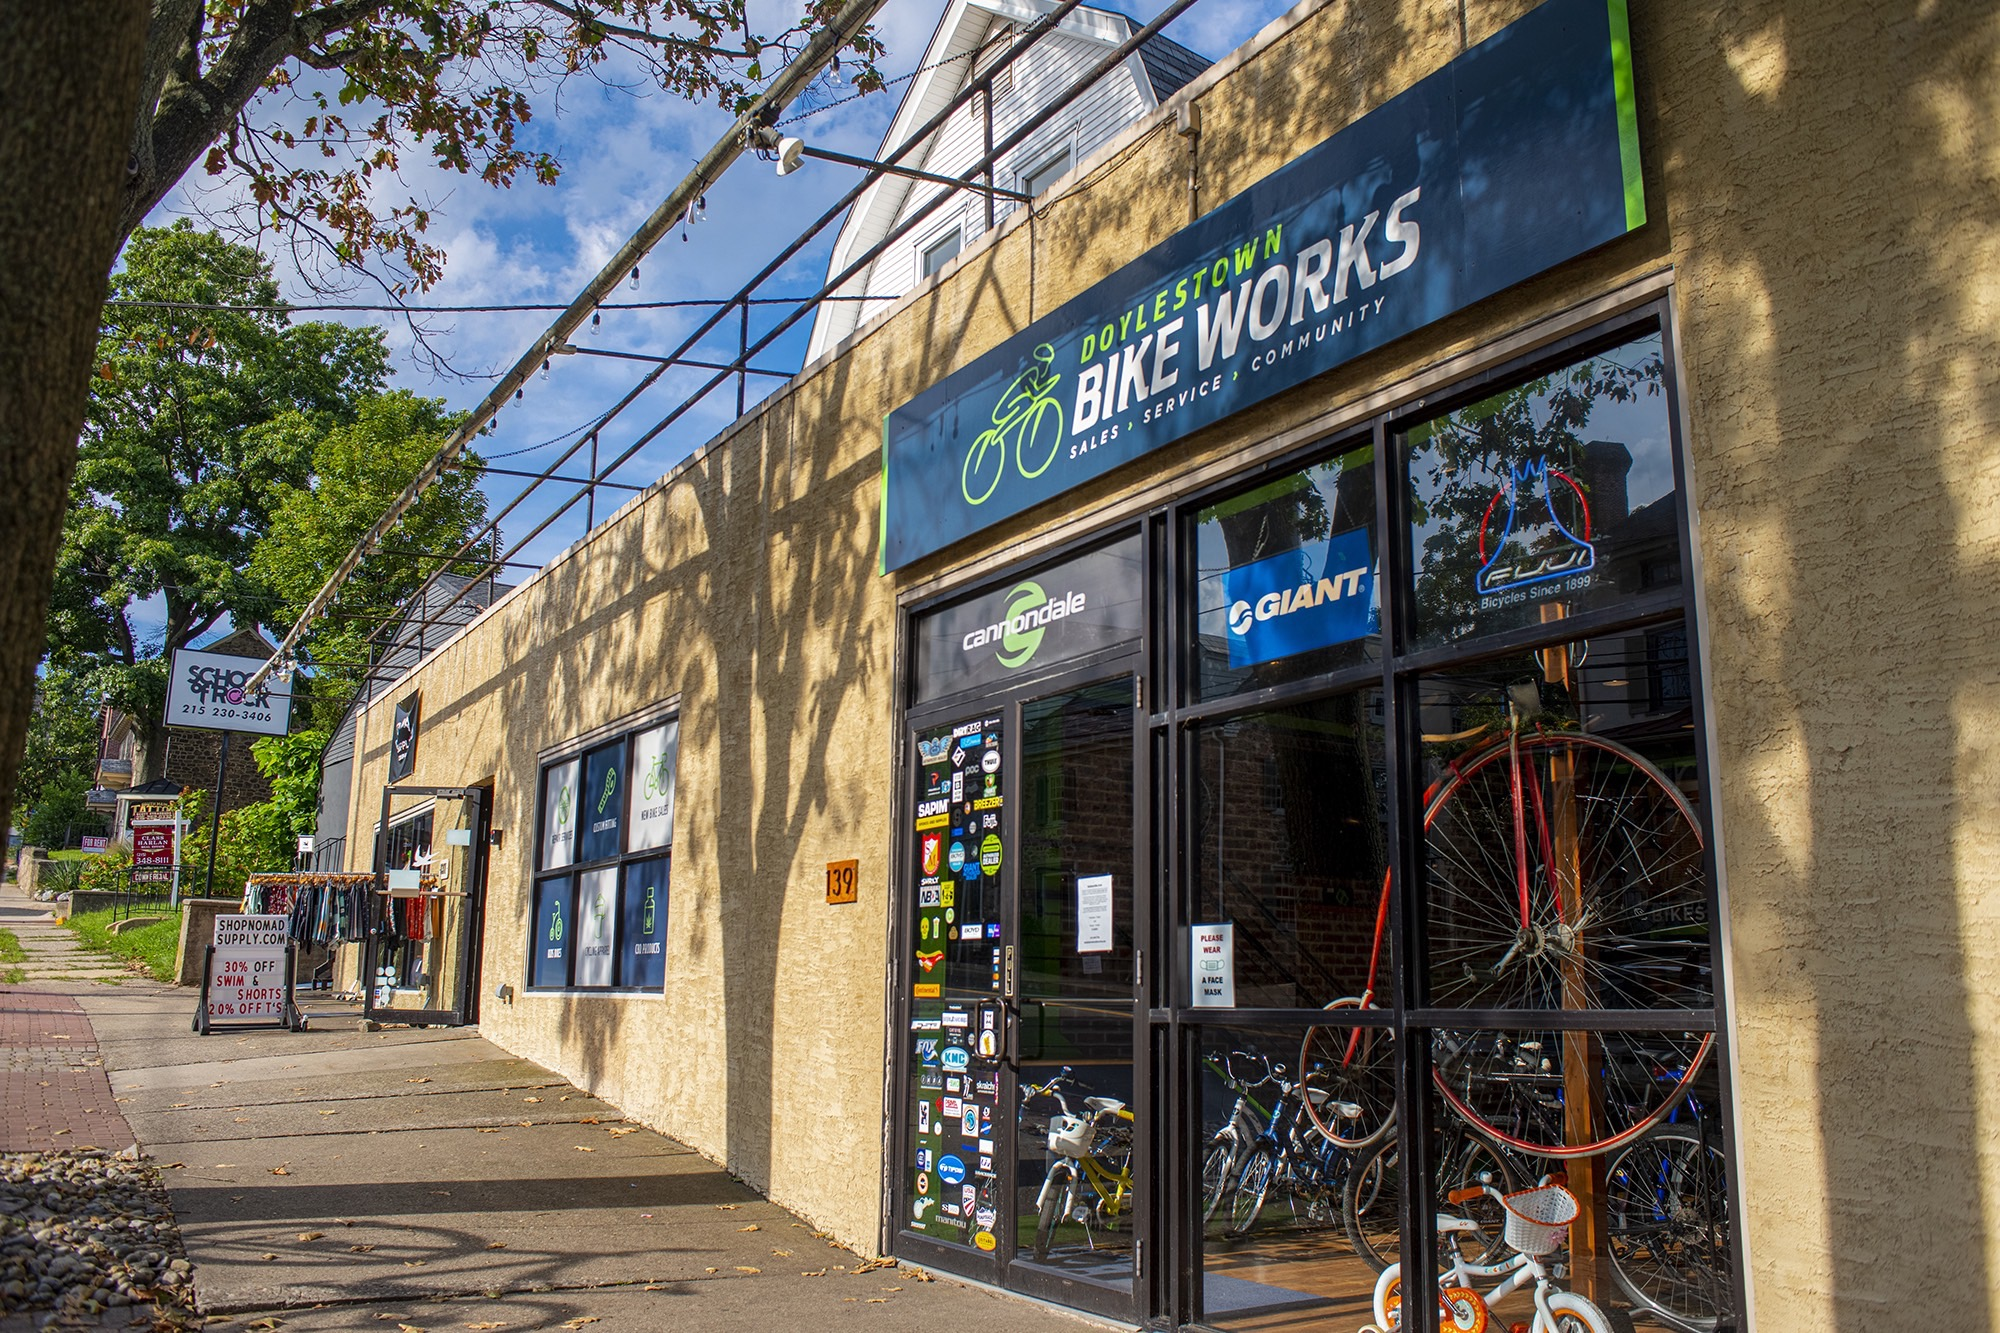 Exterior of Bike Works Doylestown